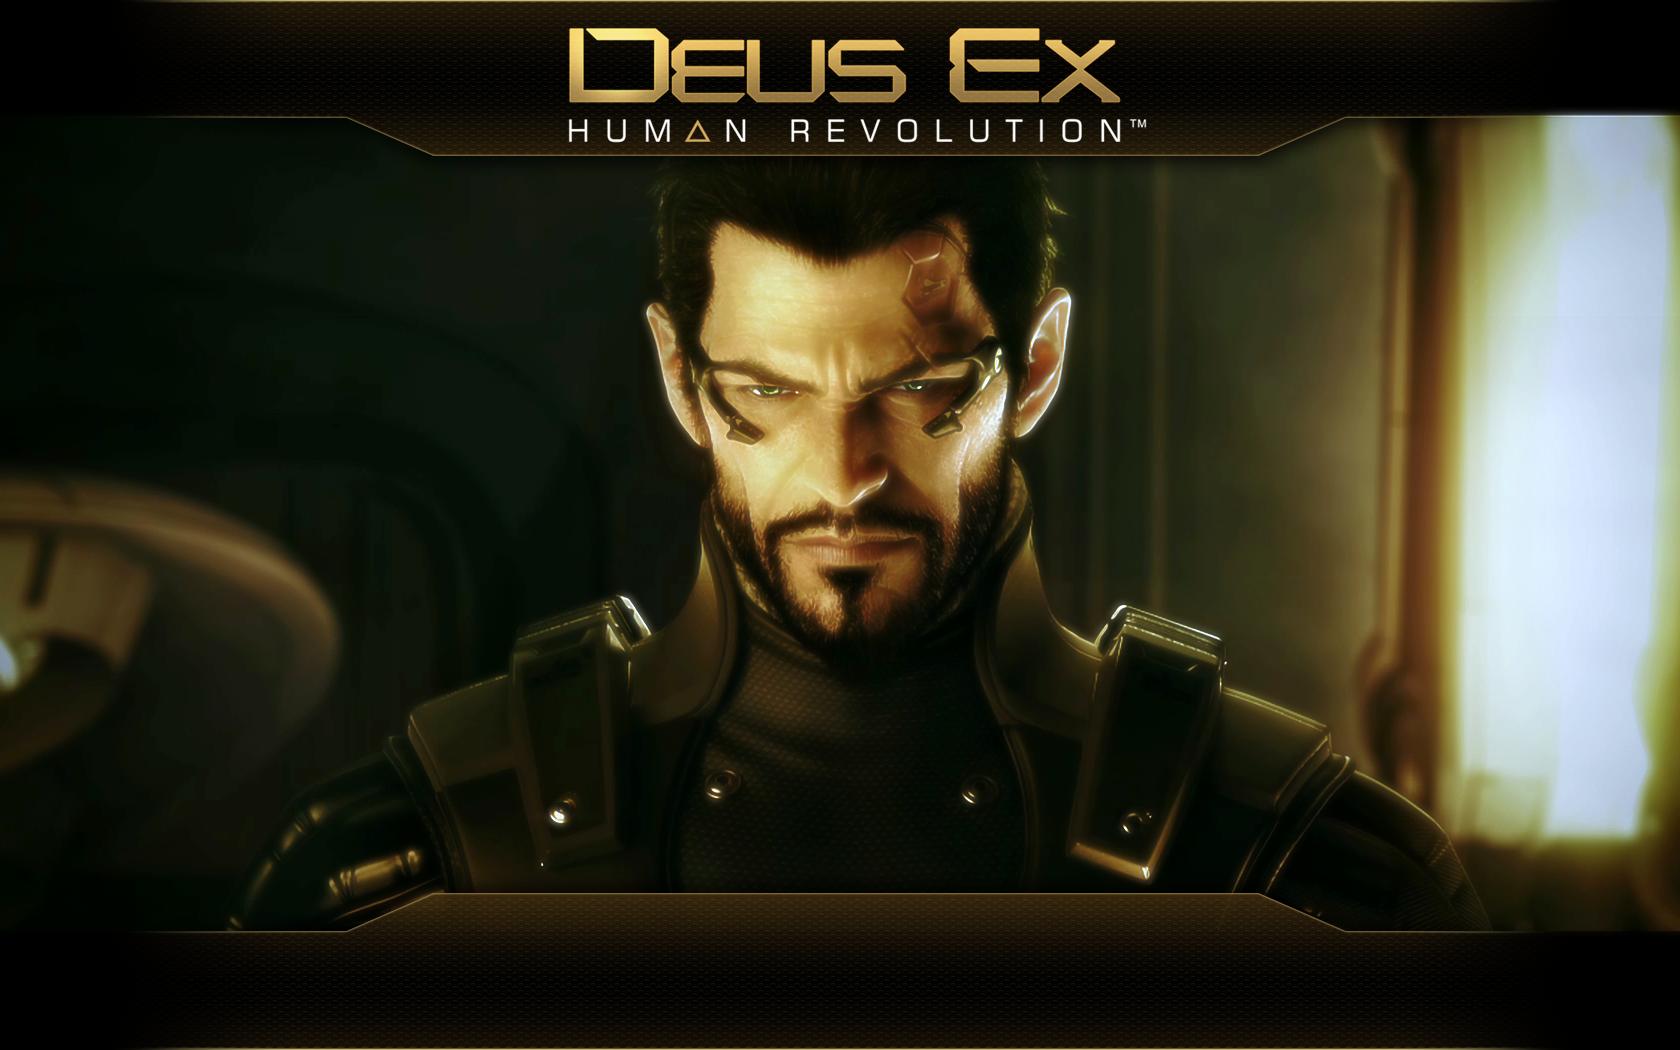 Deus_Ex_Human_Revolution